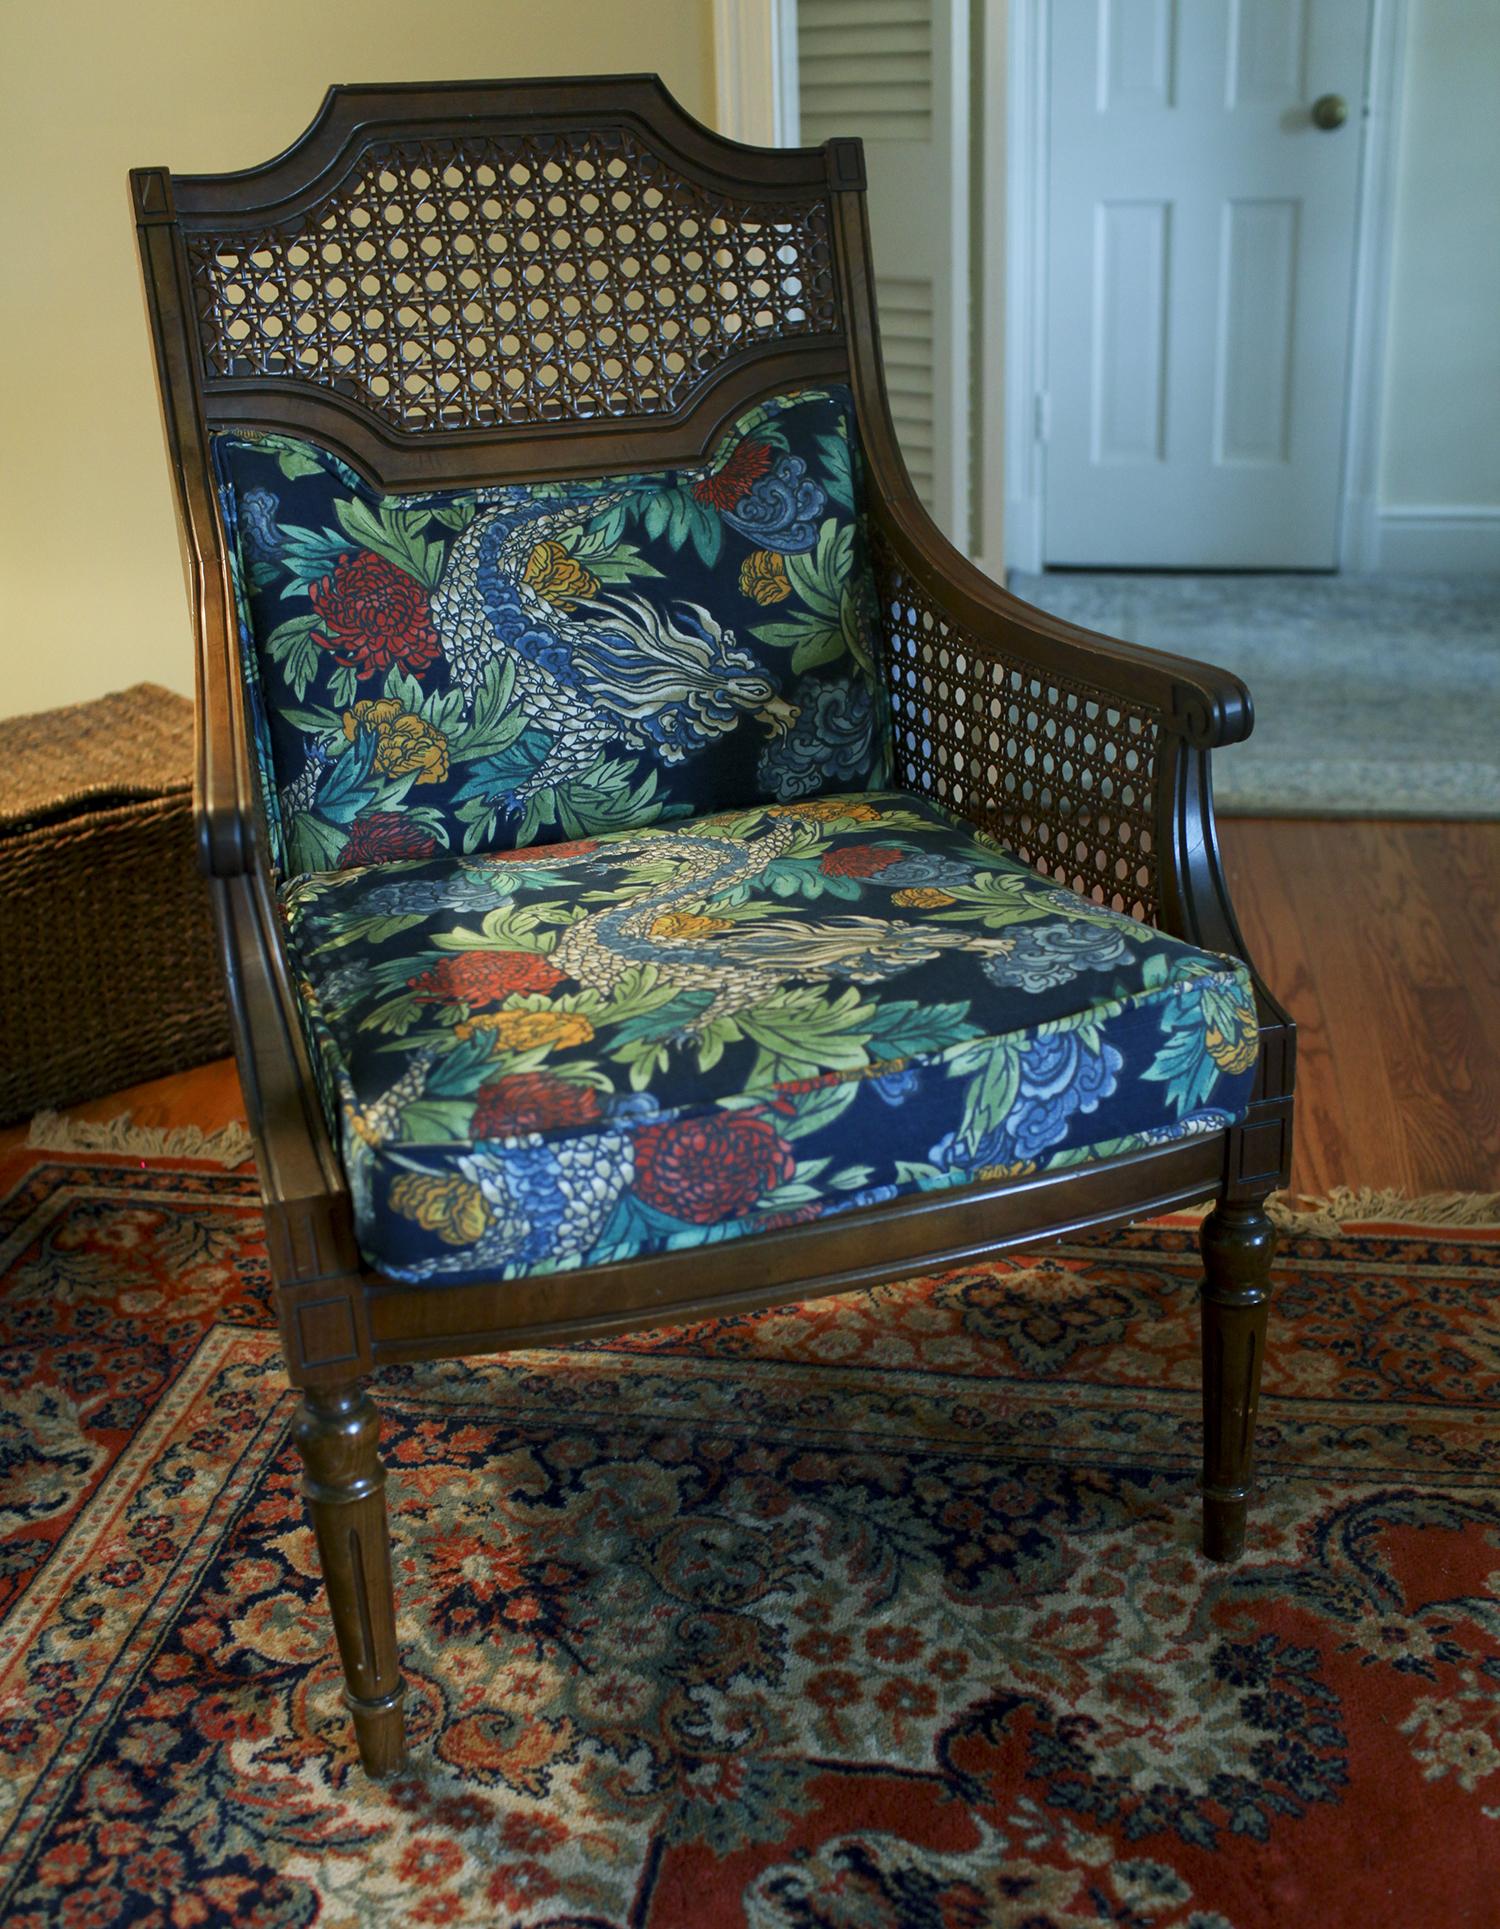 Reupholstered Craigslist Chair